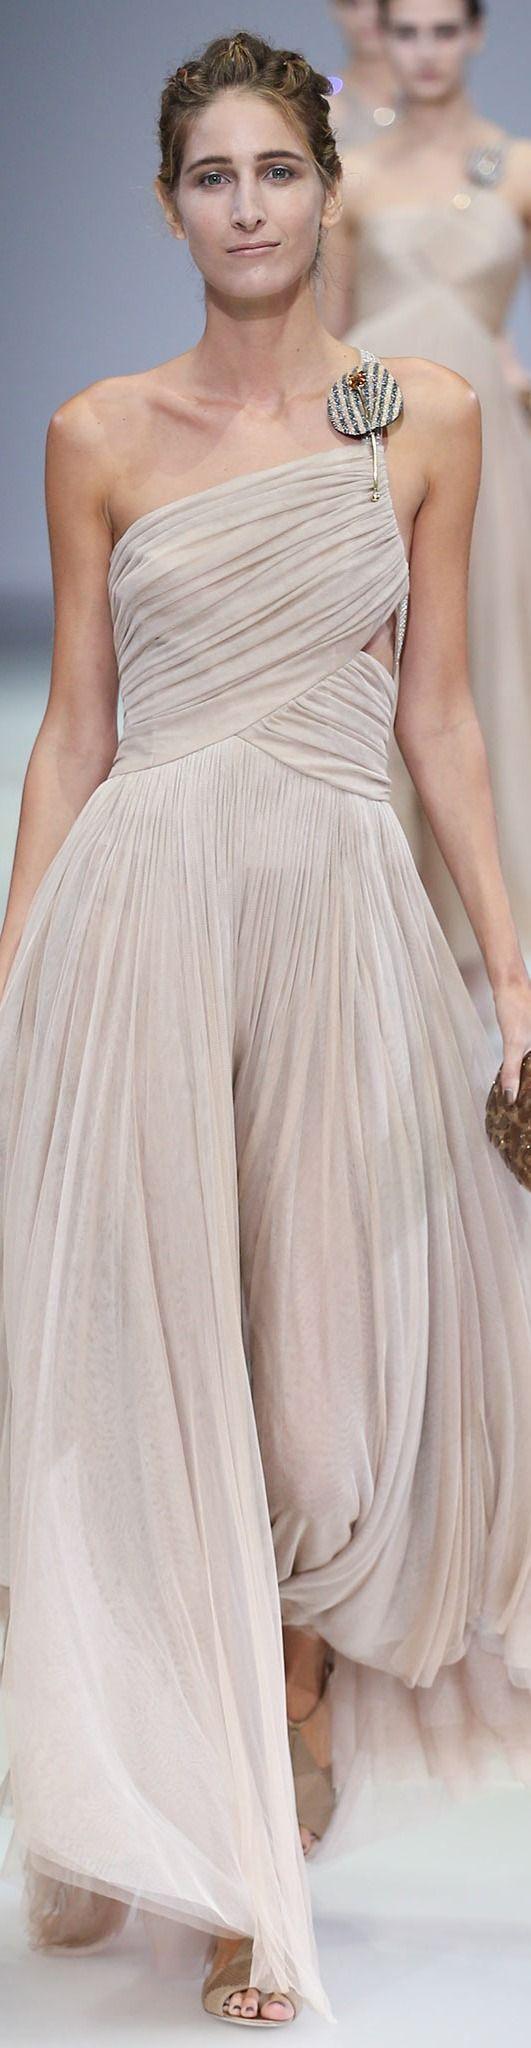 Giorgio Armani Collection Spring 2015   The House of Beccaria~